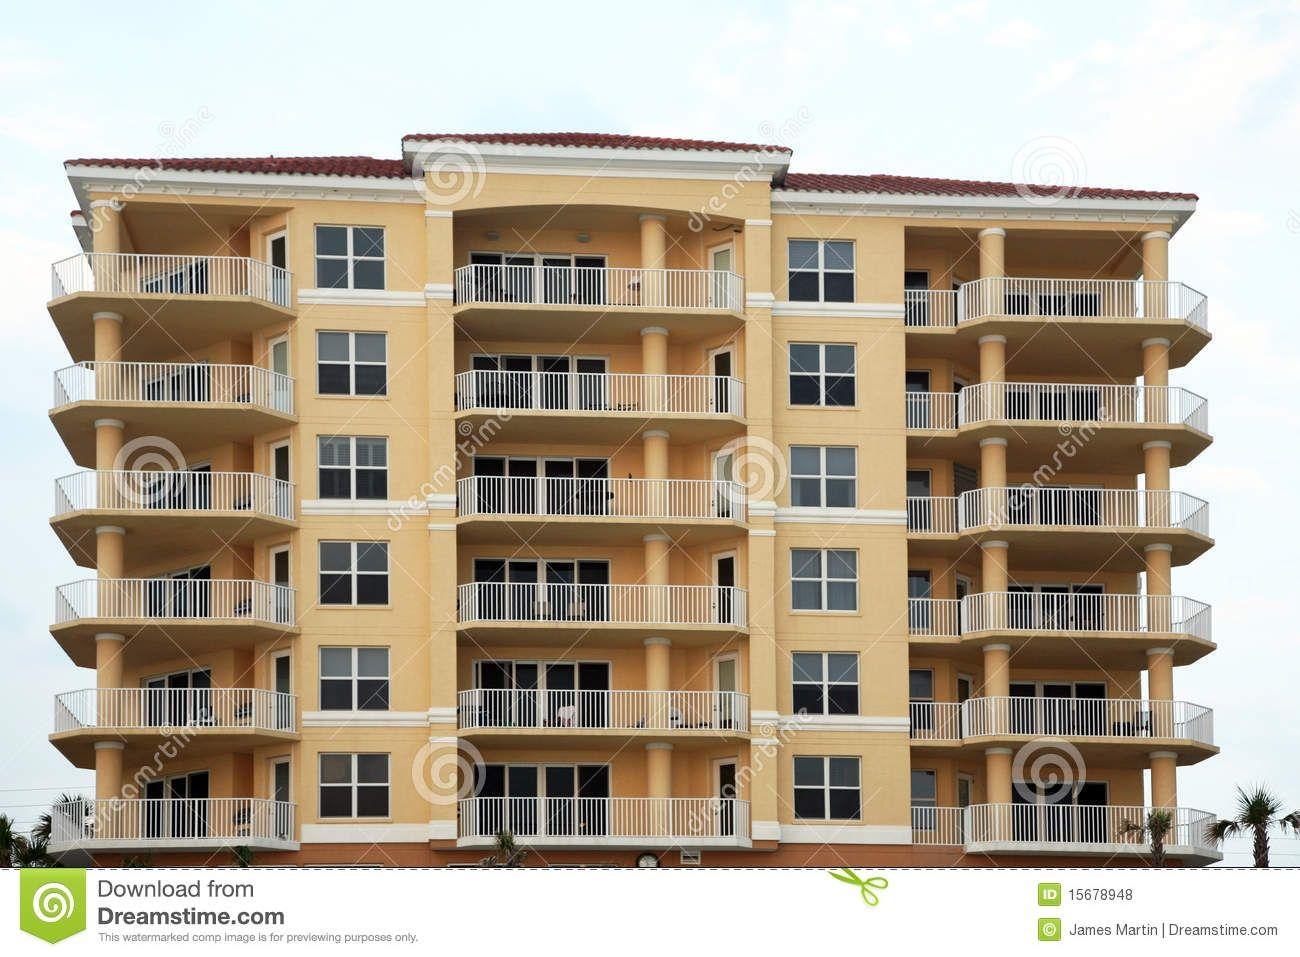 Apartment Complex clipart #14